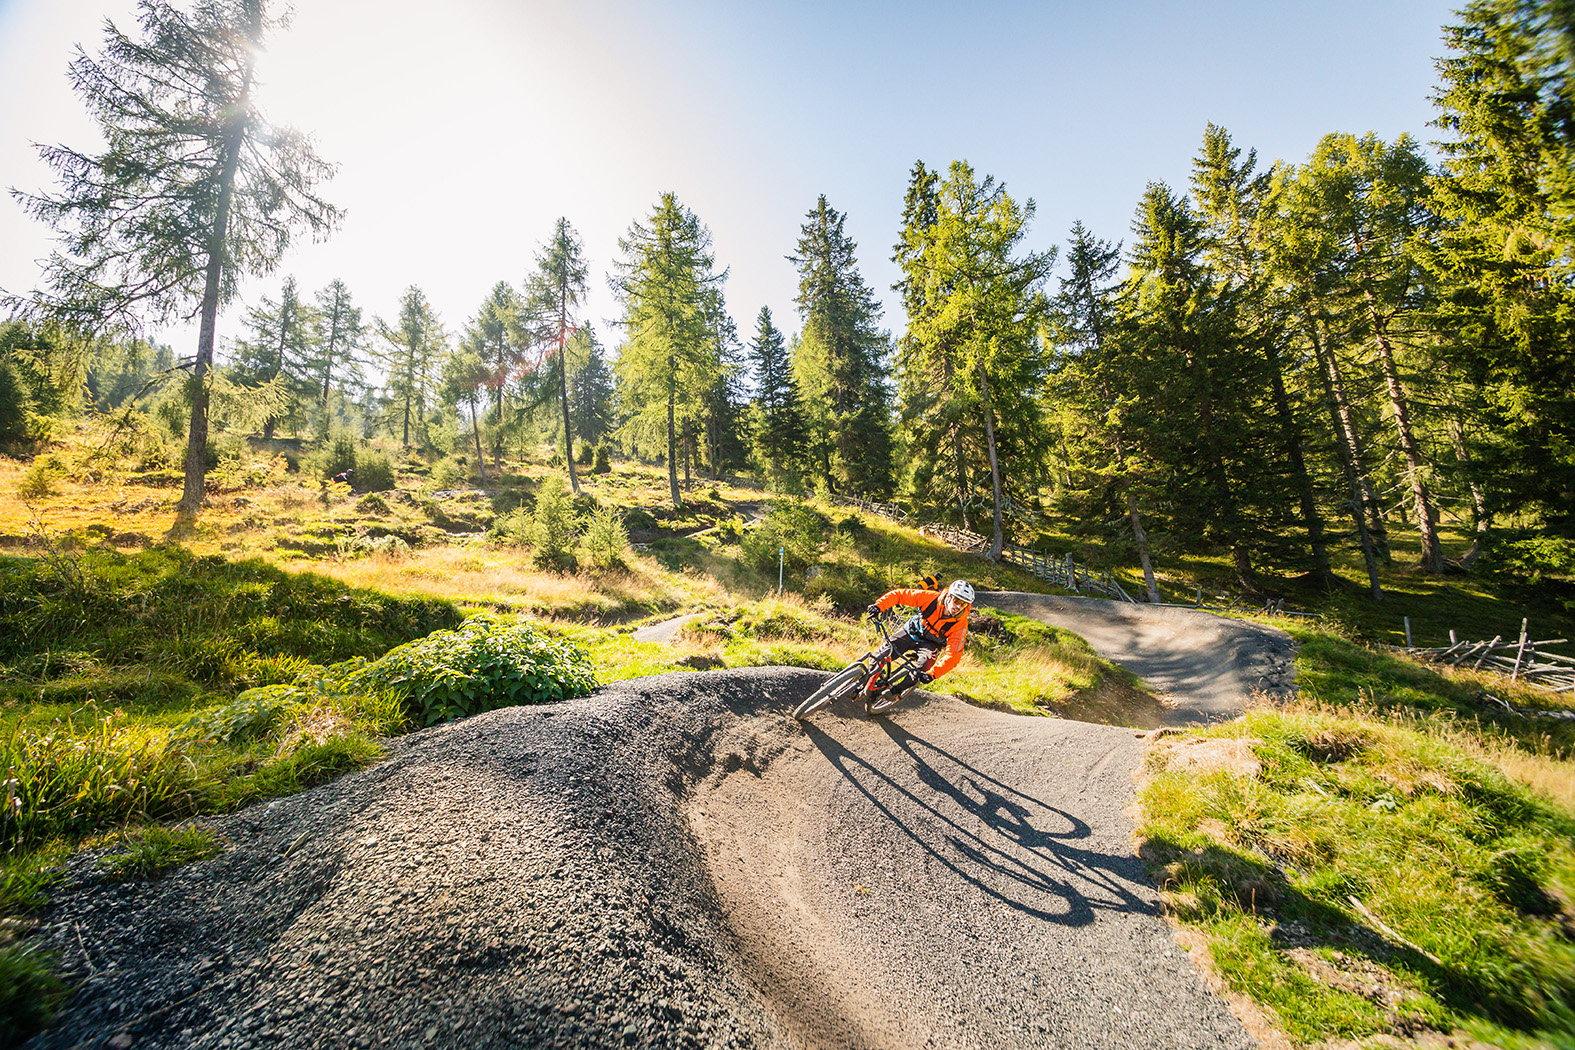 Flow-Country-Trail_Lichtung___BRM_-_Mathias_Praegant